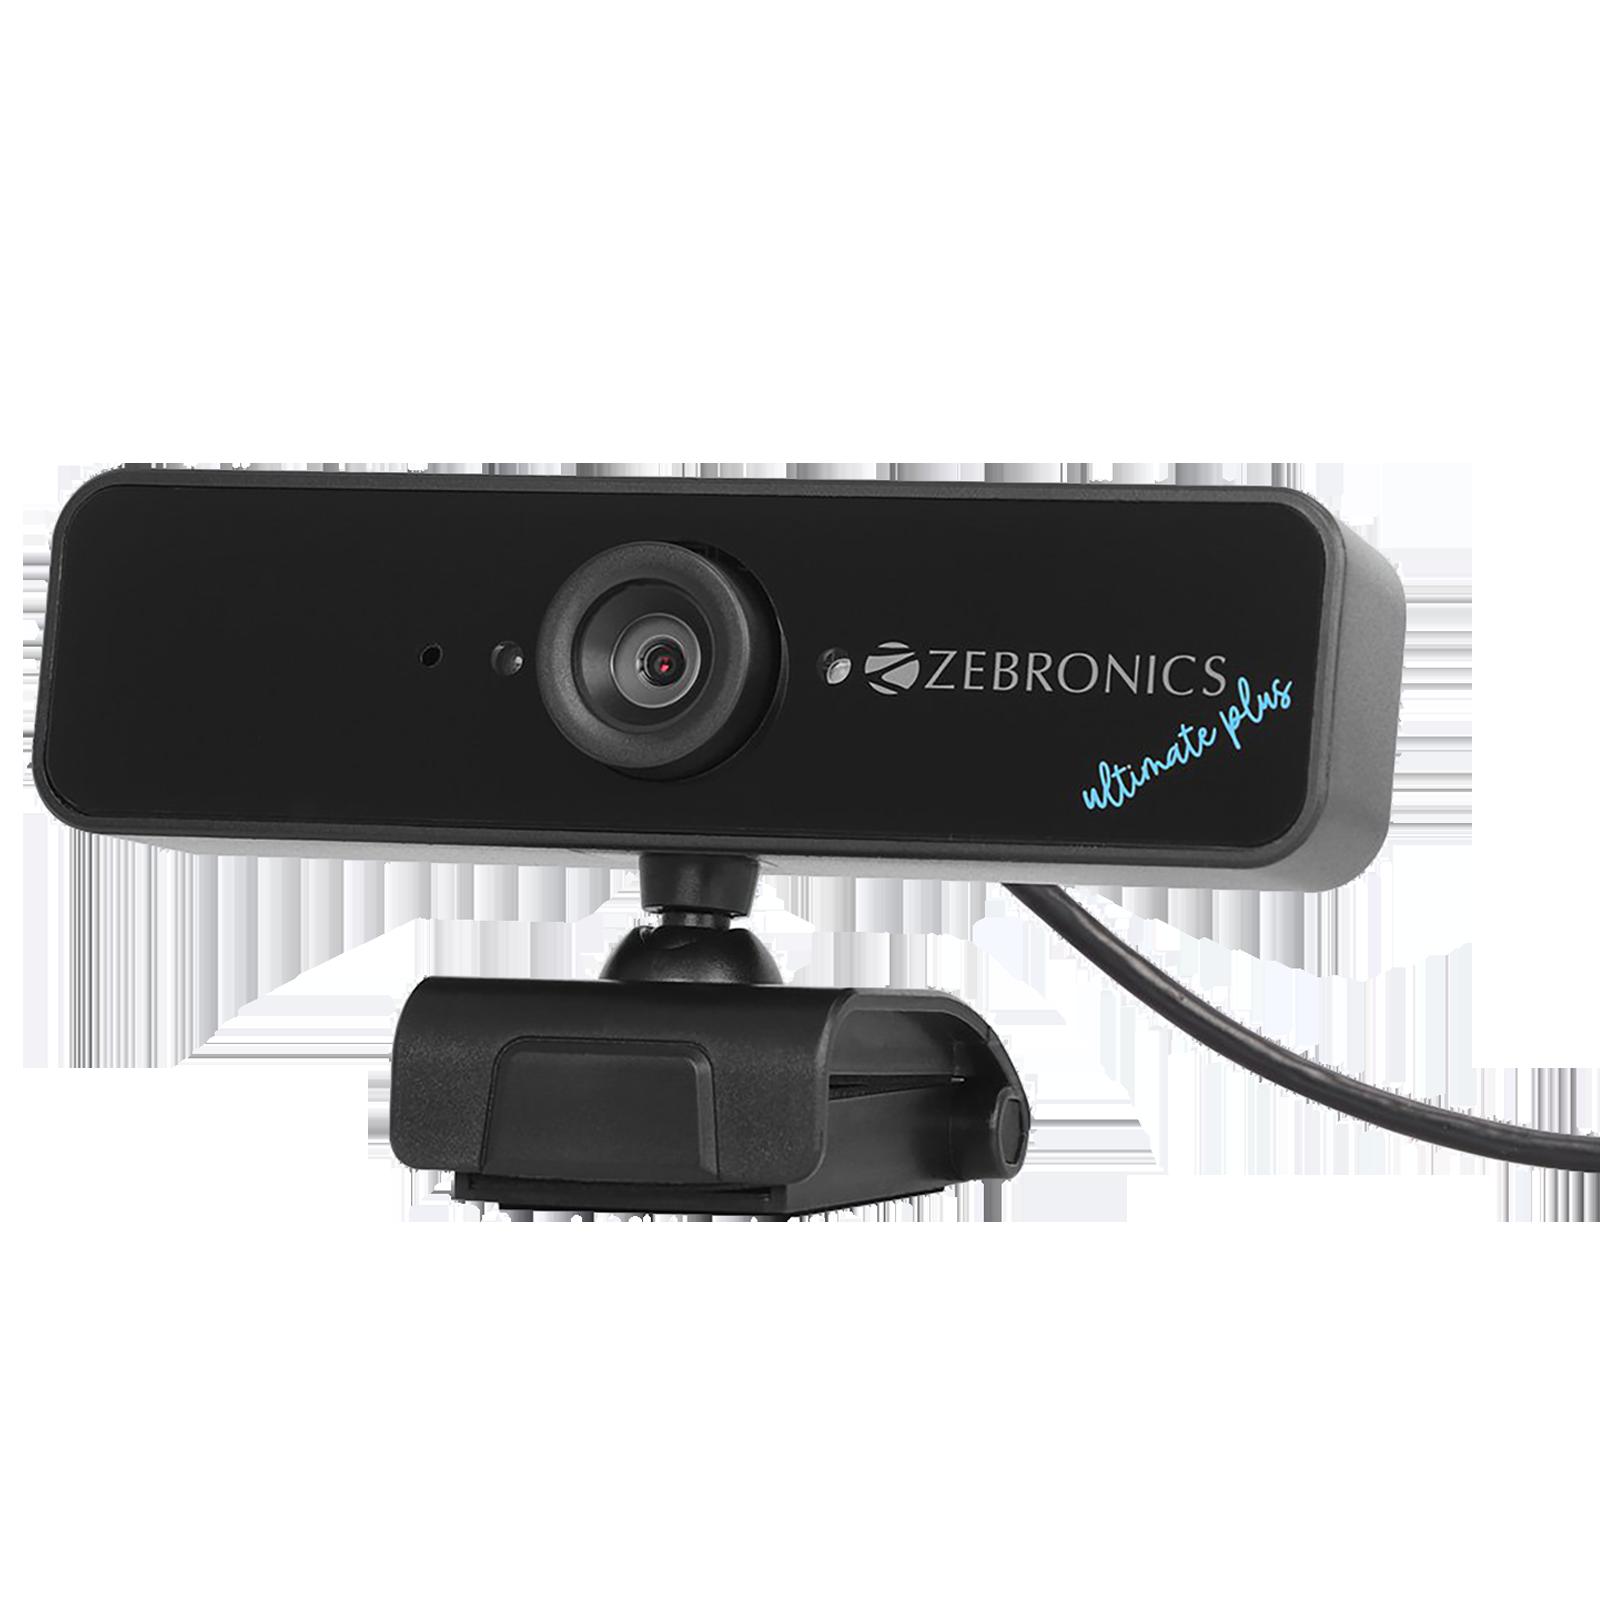 Zebronics USB Web Cam (Night Vision, ZEB-Ultimate Plus, Black)_1